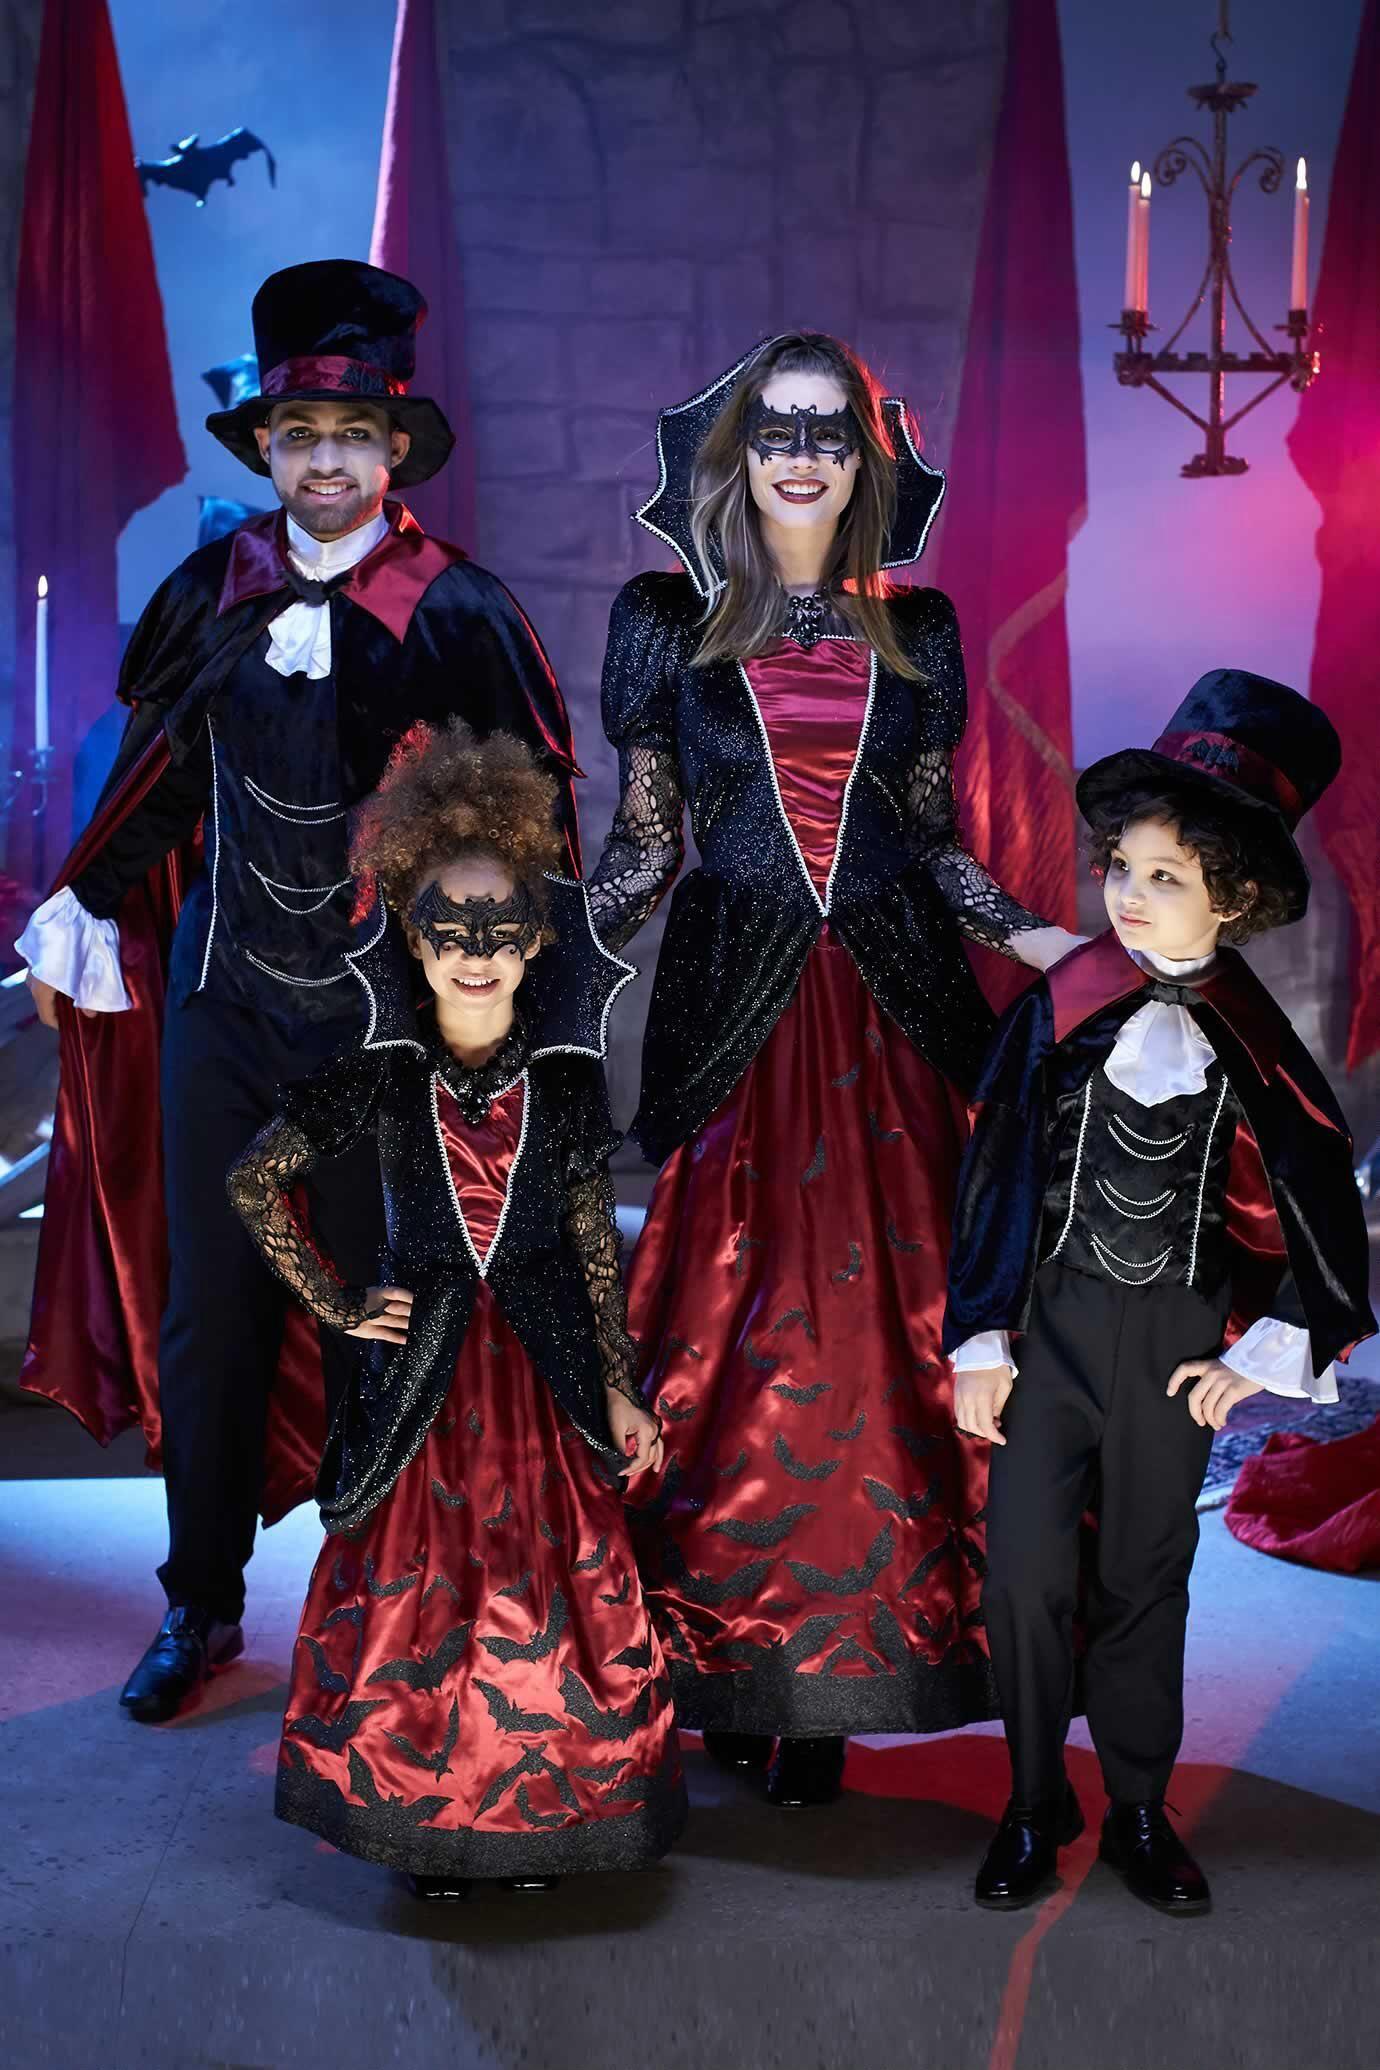 Batty Vampire Costume for Men - Chasing Fireflies - Vampire costume kids, Halloween costumes for ...